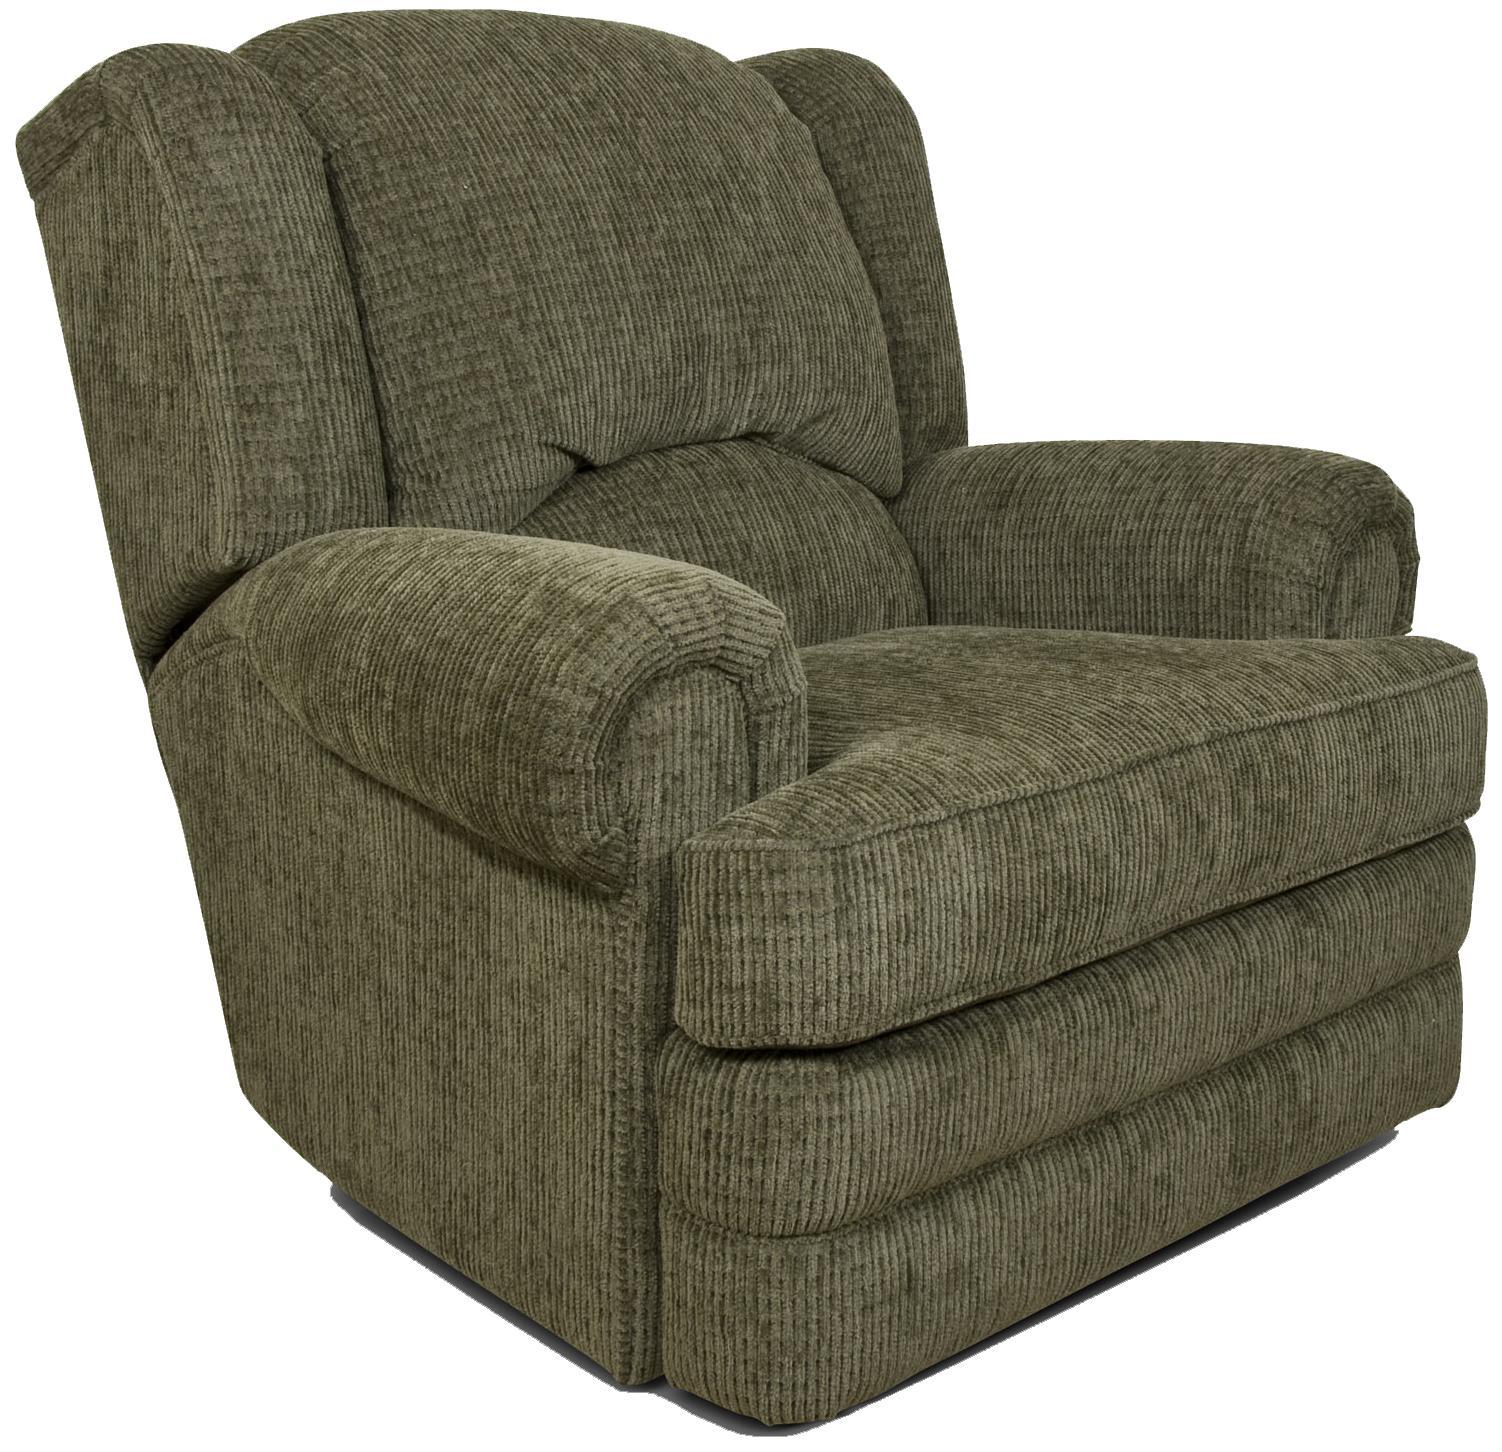 England Drake Chair - Item Number: 2934